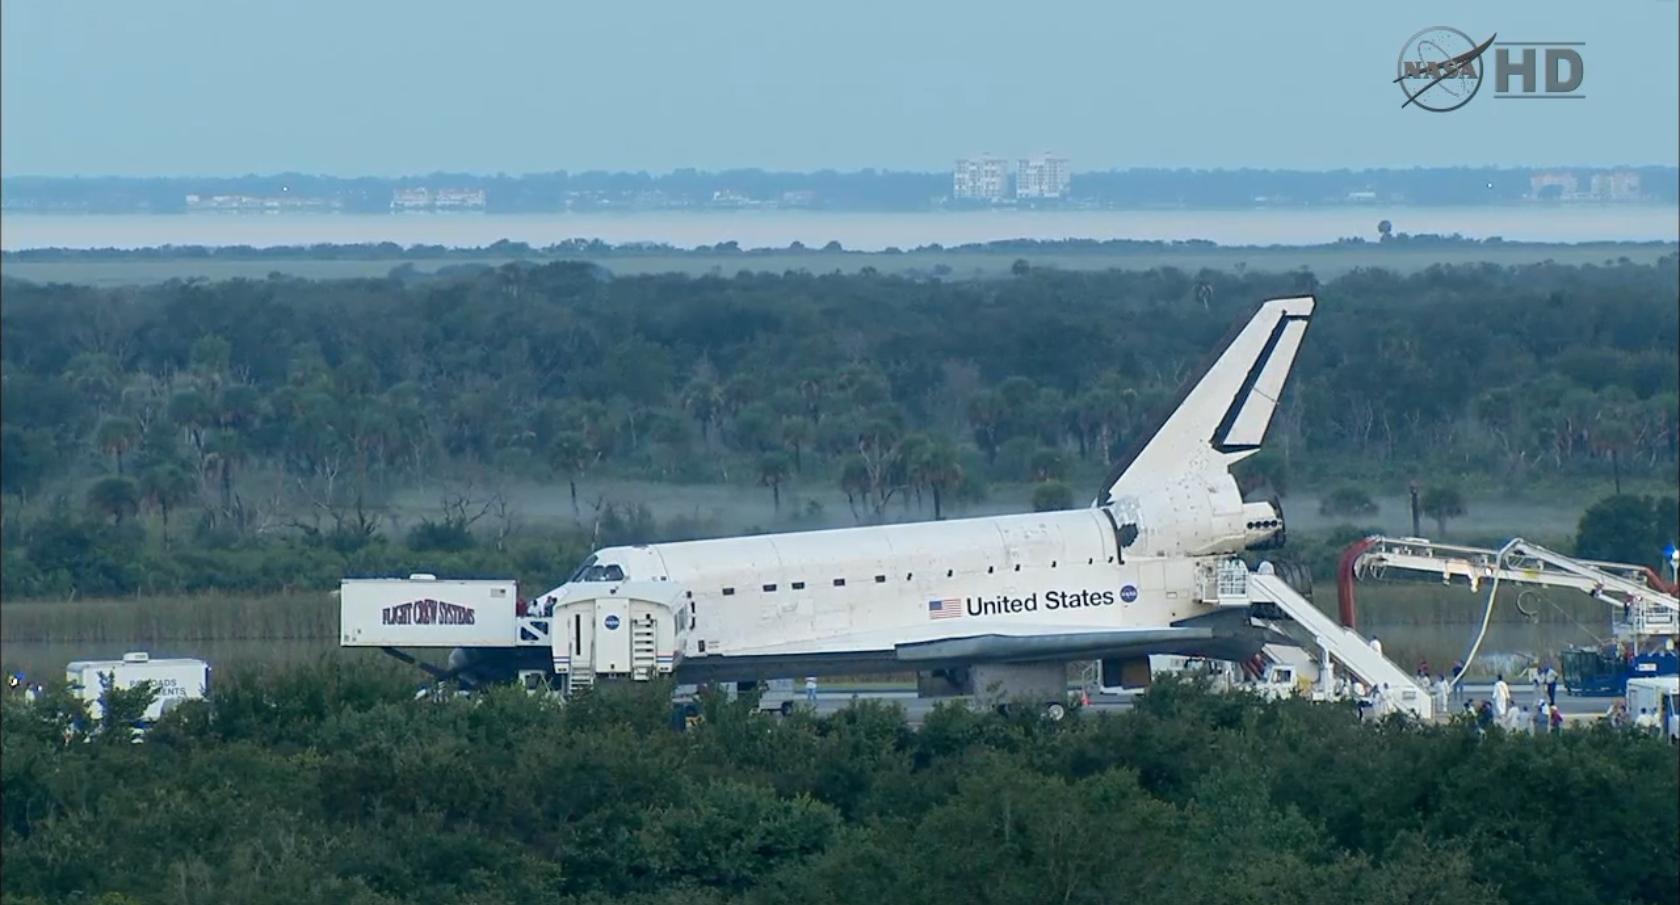 us space shuttle program shut down - photo #19